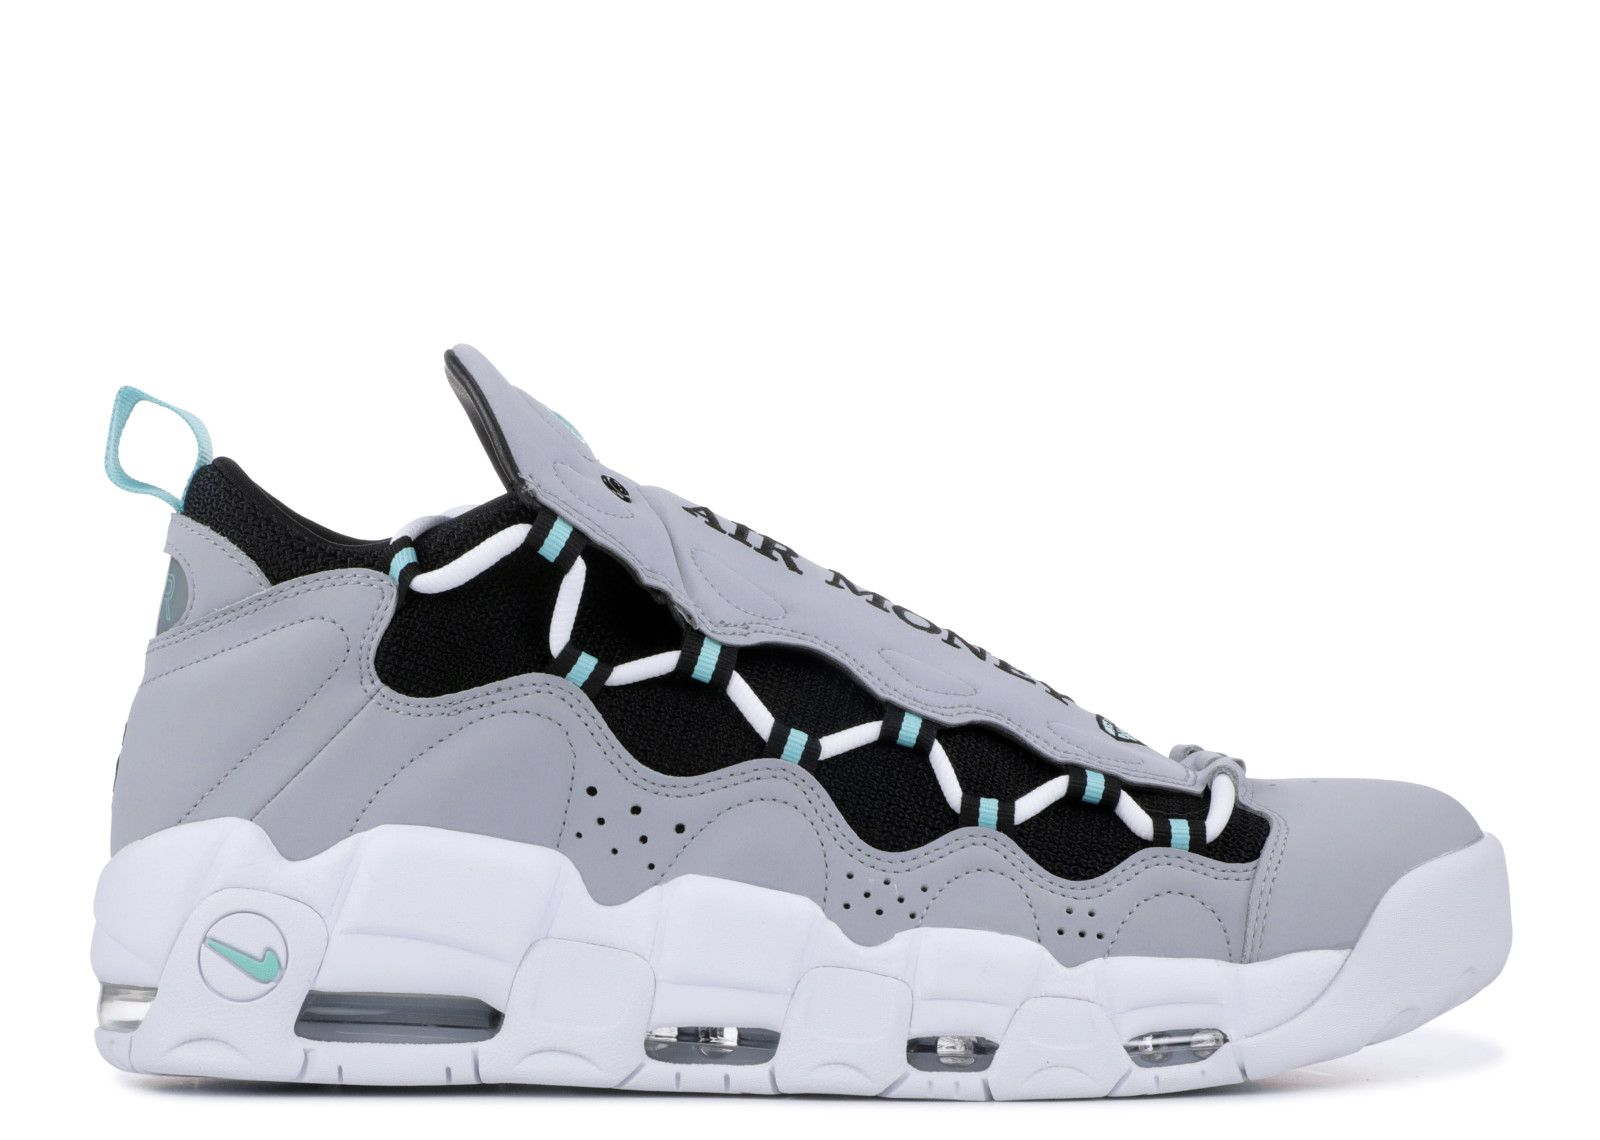 Air More Money Nike AJ2998 003 wolf grey/island